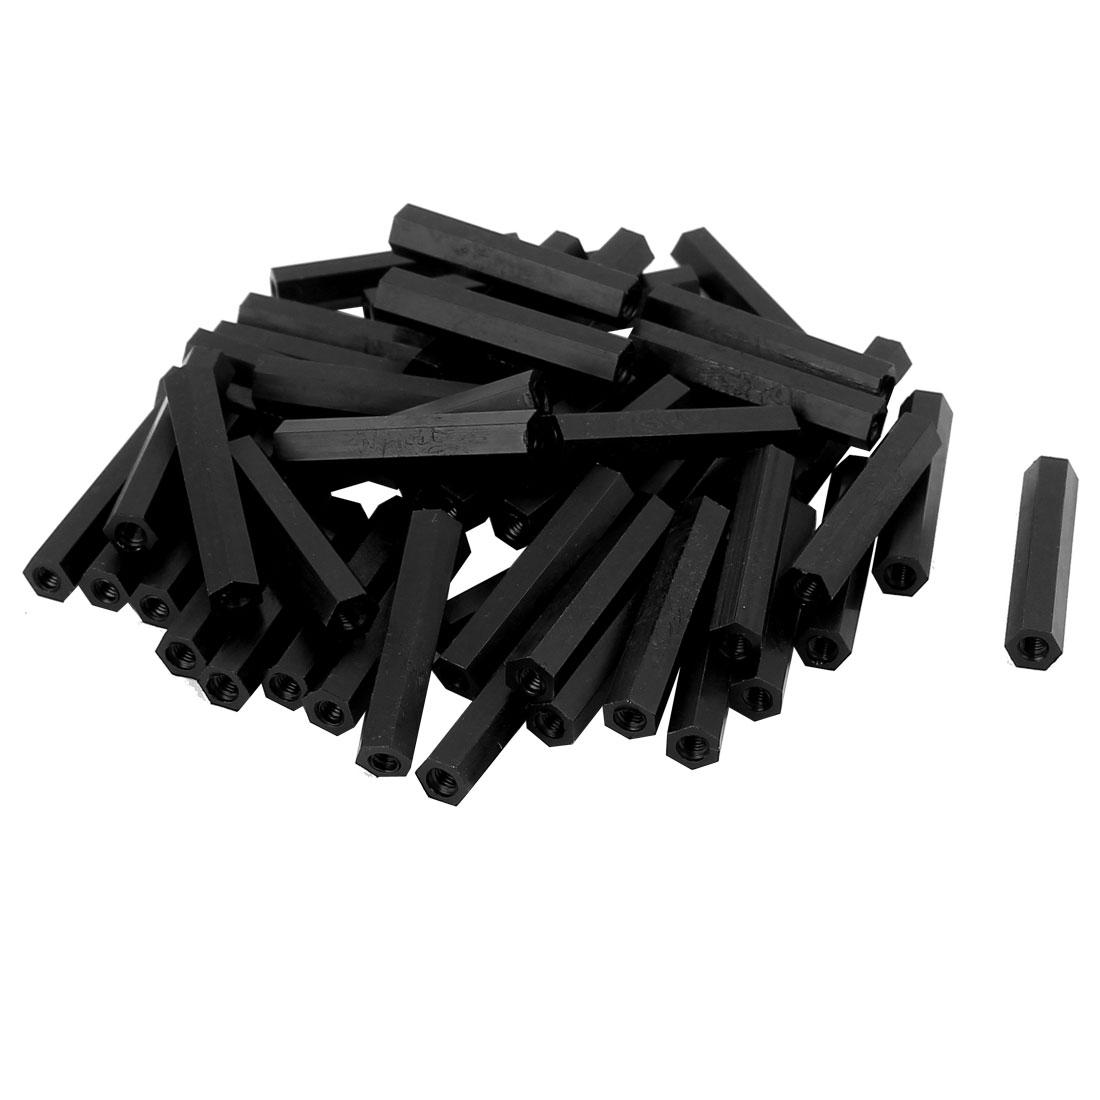 50Pcs M3x30mm Nylon Hex PCB Spacer Standoff Pillar Female Screw Nut Black